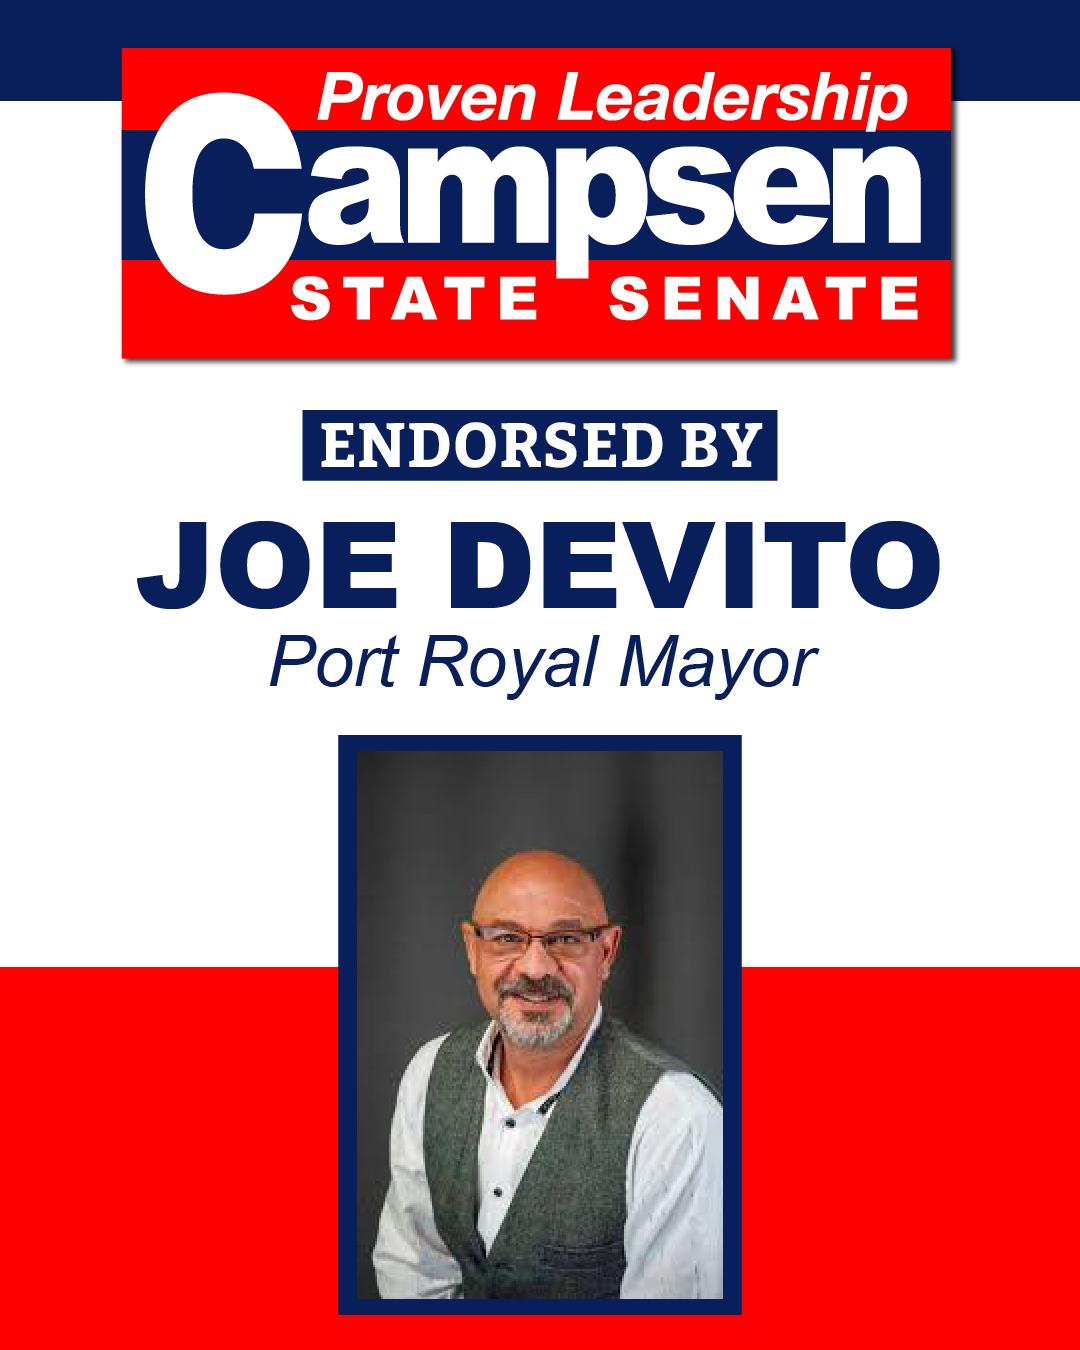 201026_Chip Campsen_Endorsement_ Joe DeVito-01